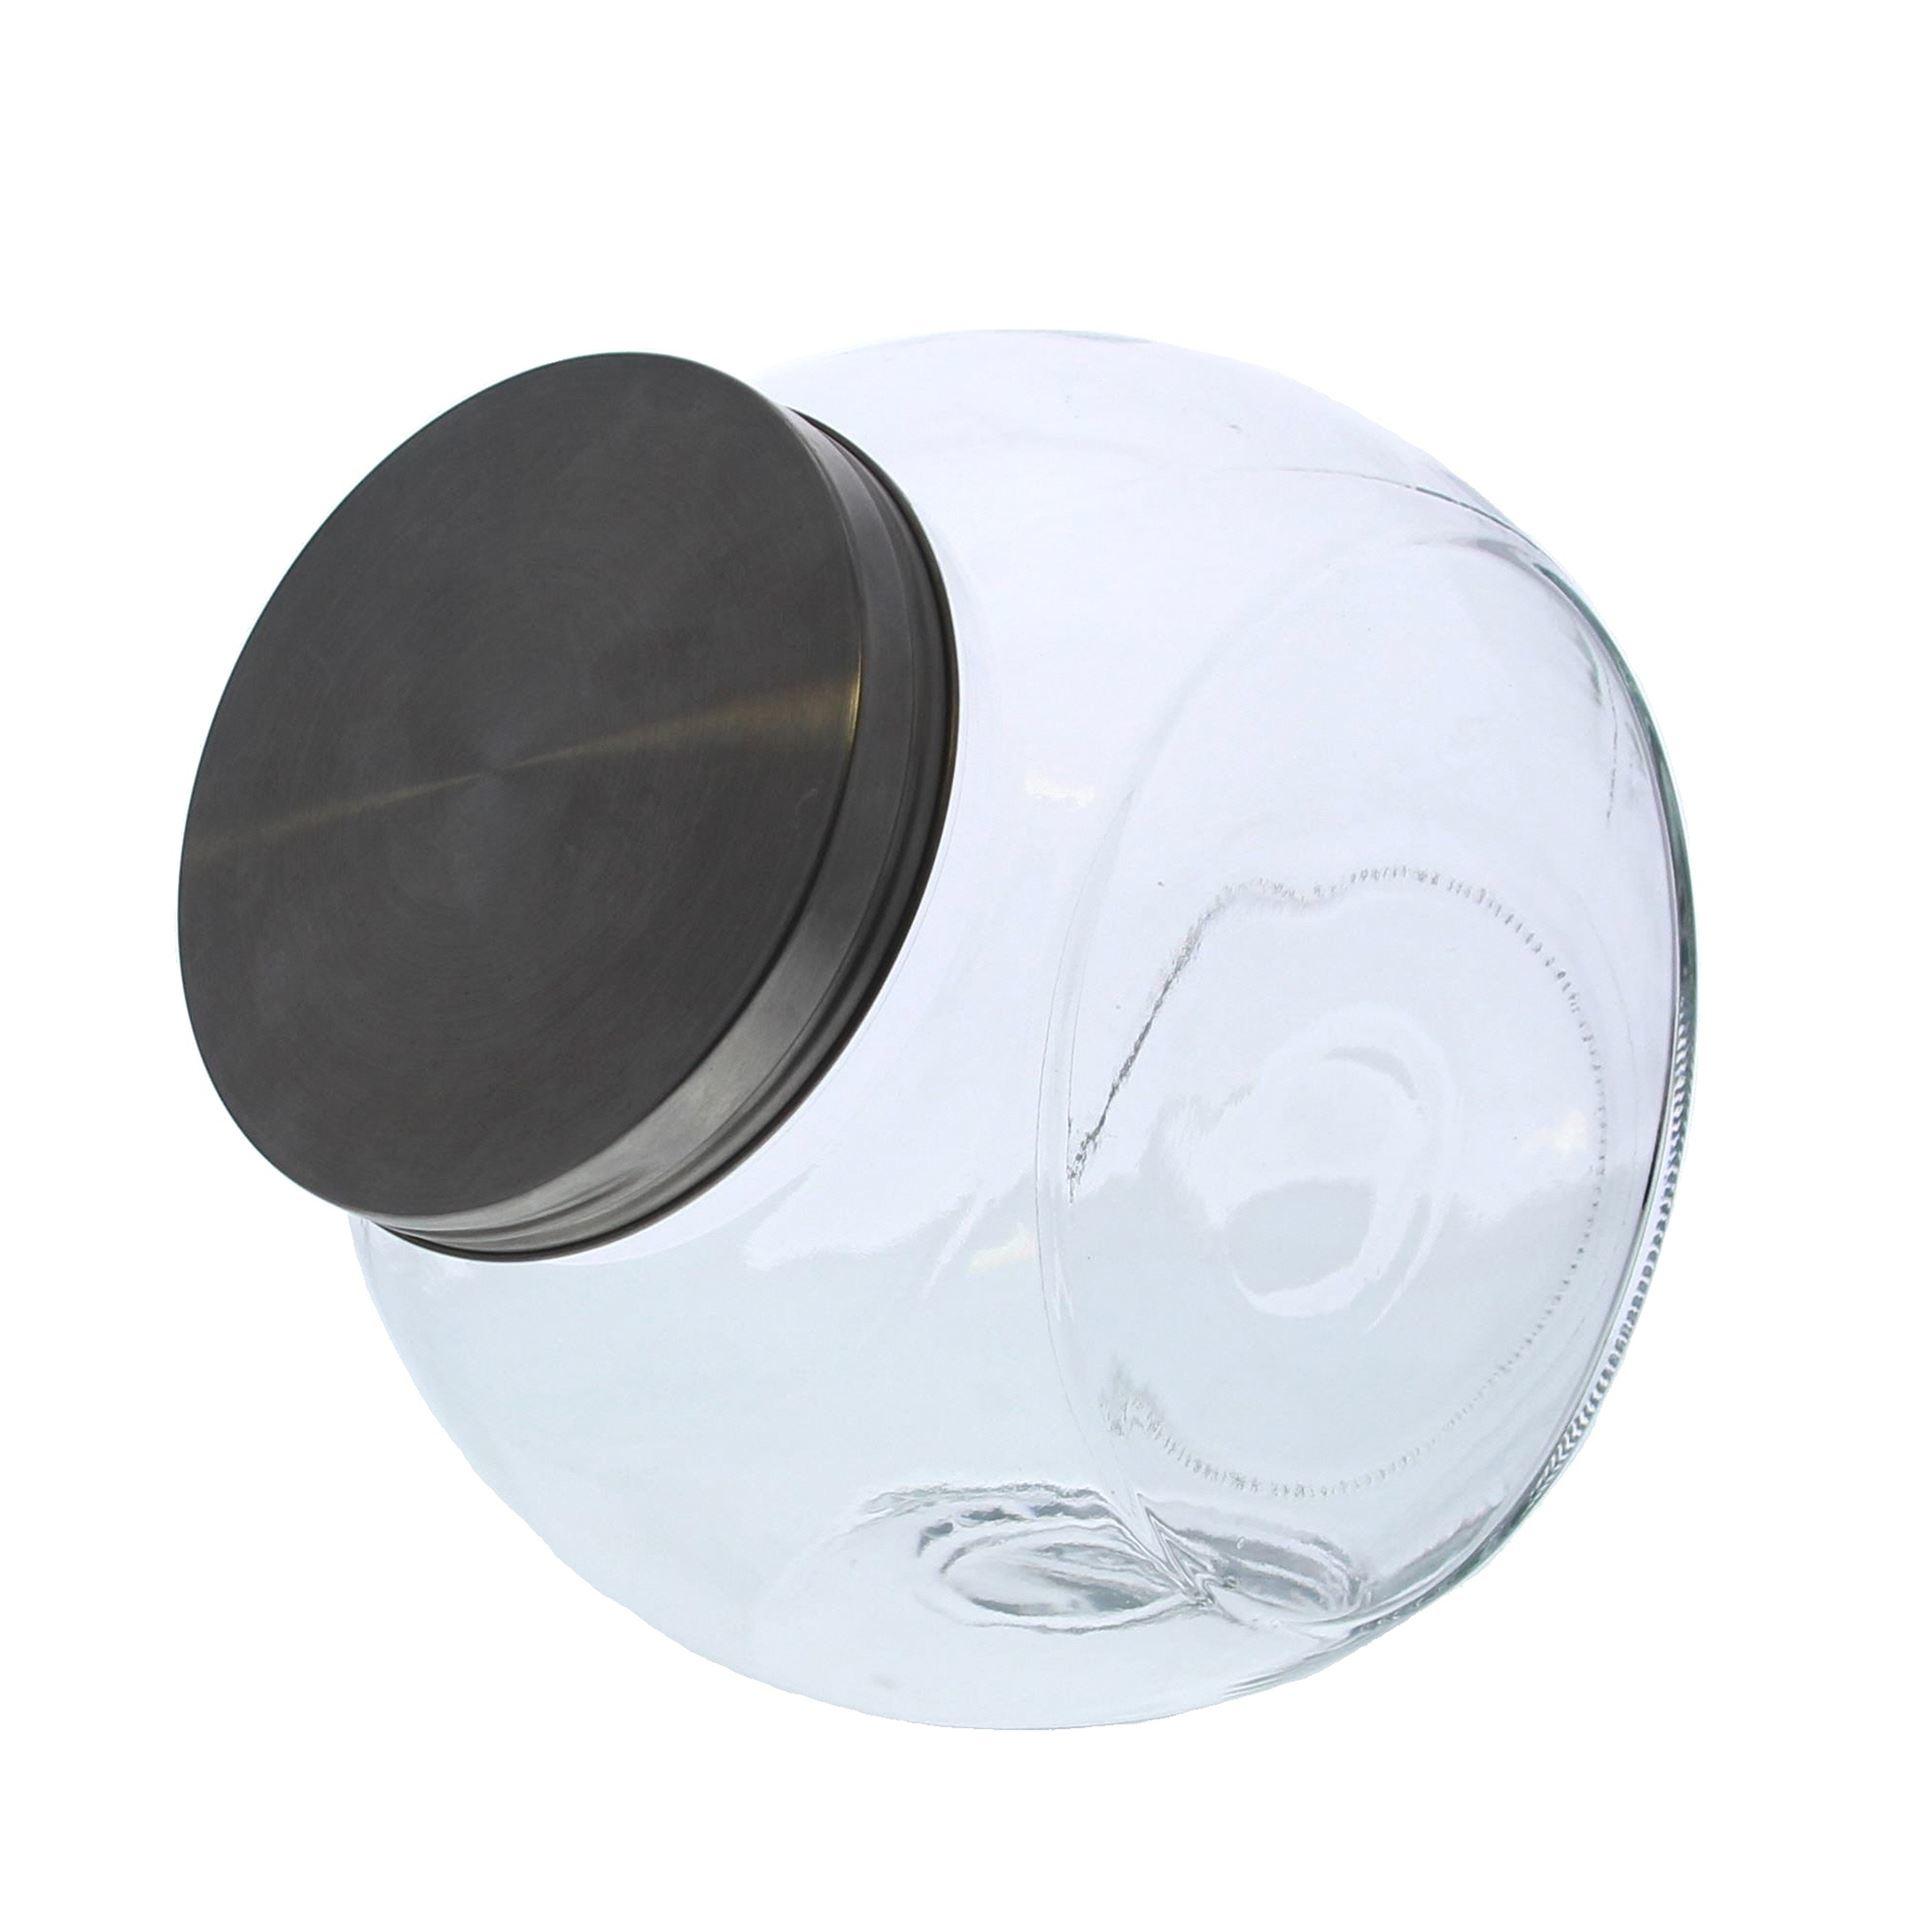 Glas Metall Schraubverschluss - verfügbar in 4 Massen